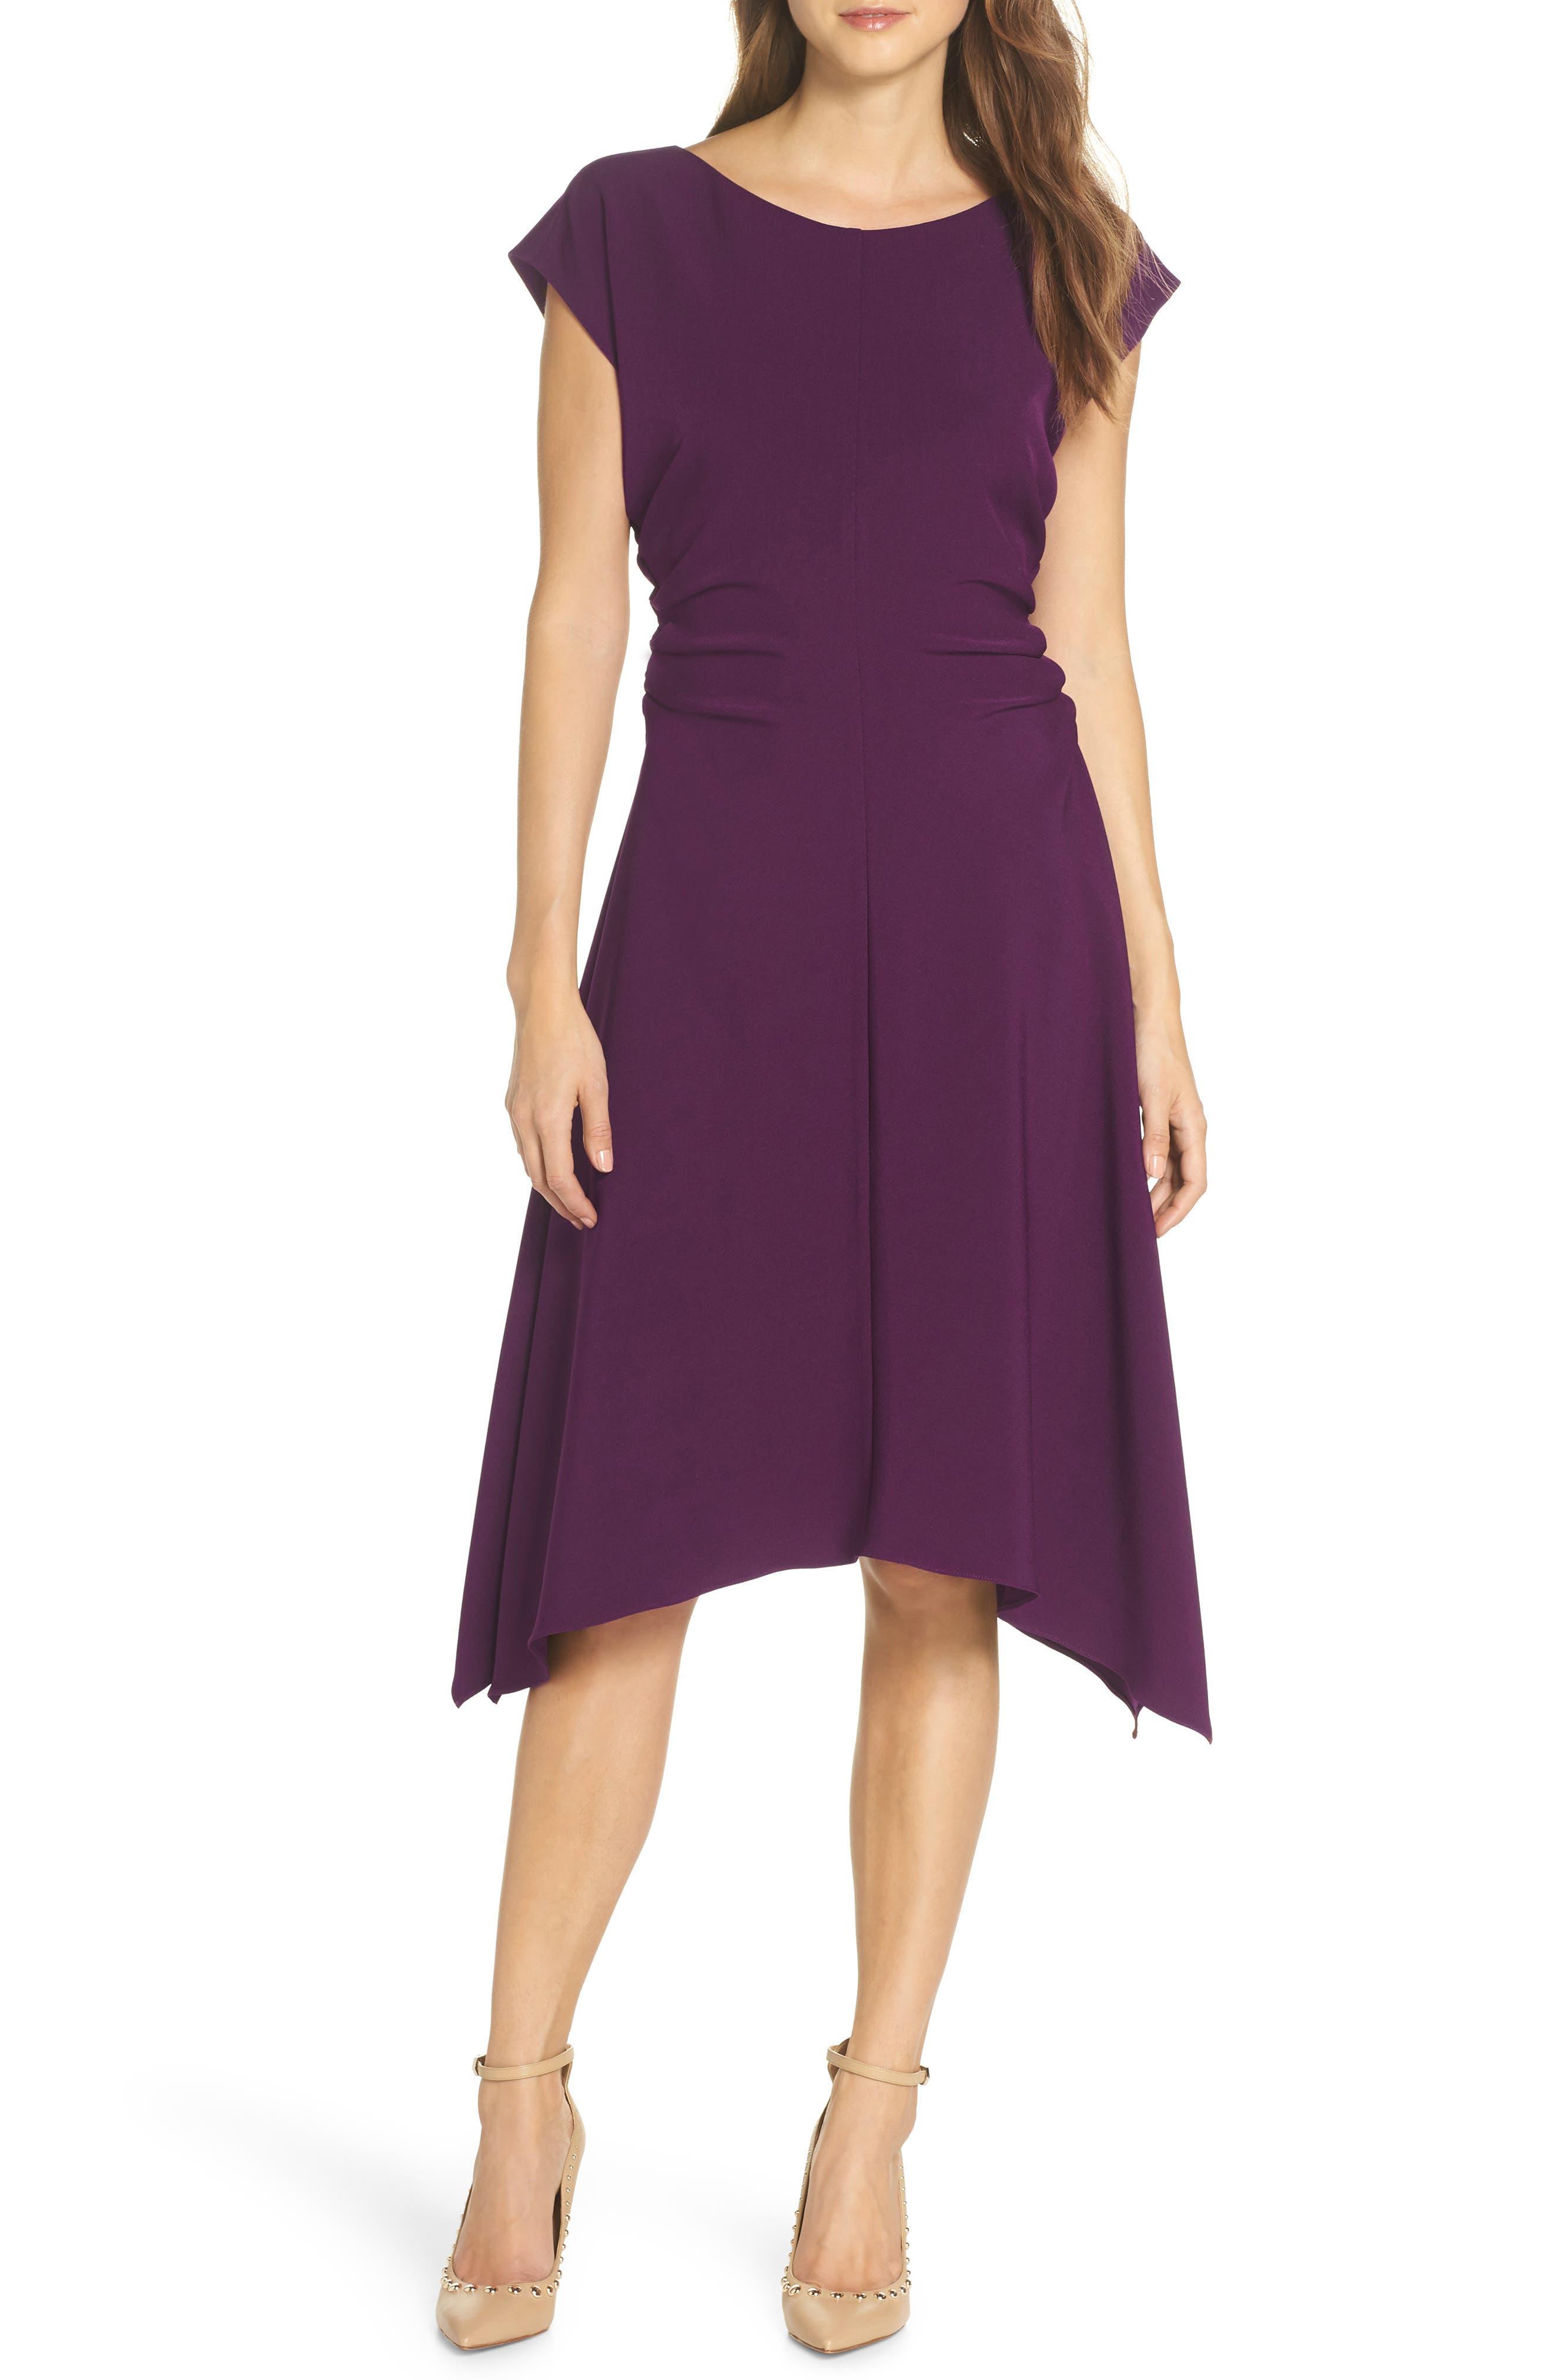 JULIA JORDAN Ruched Stretch Crepe Fit & Flare Dress, Main, color, PLUM